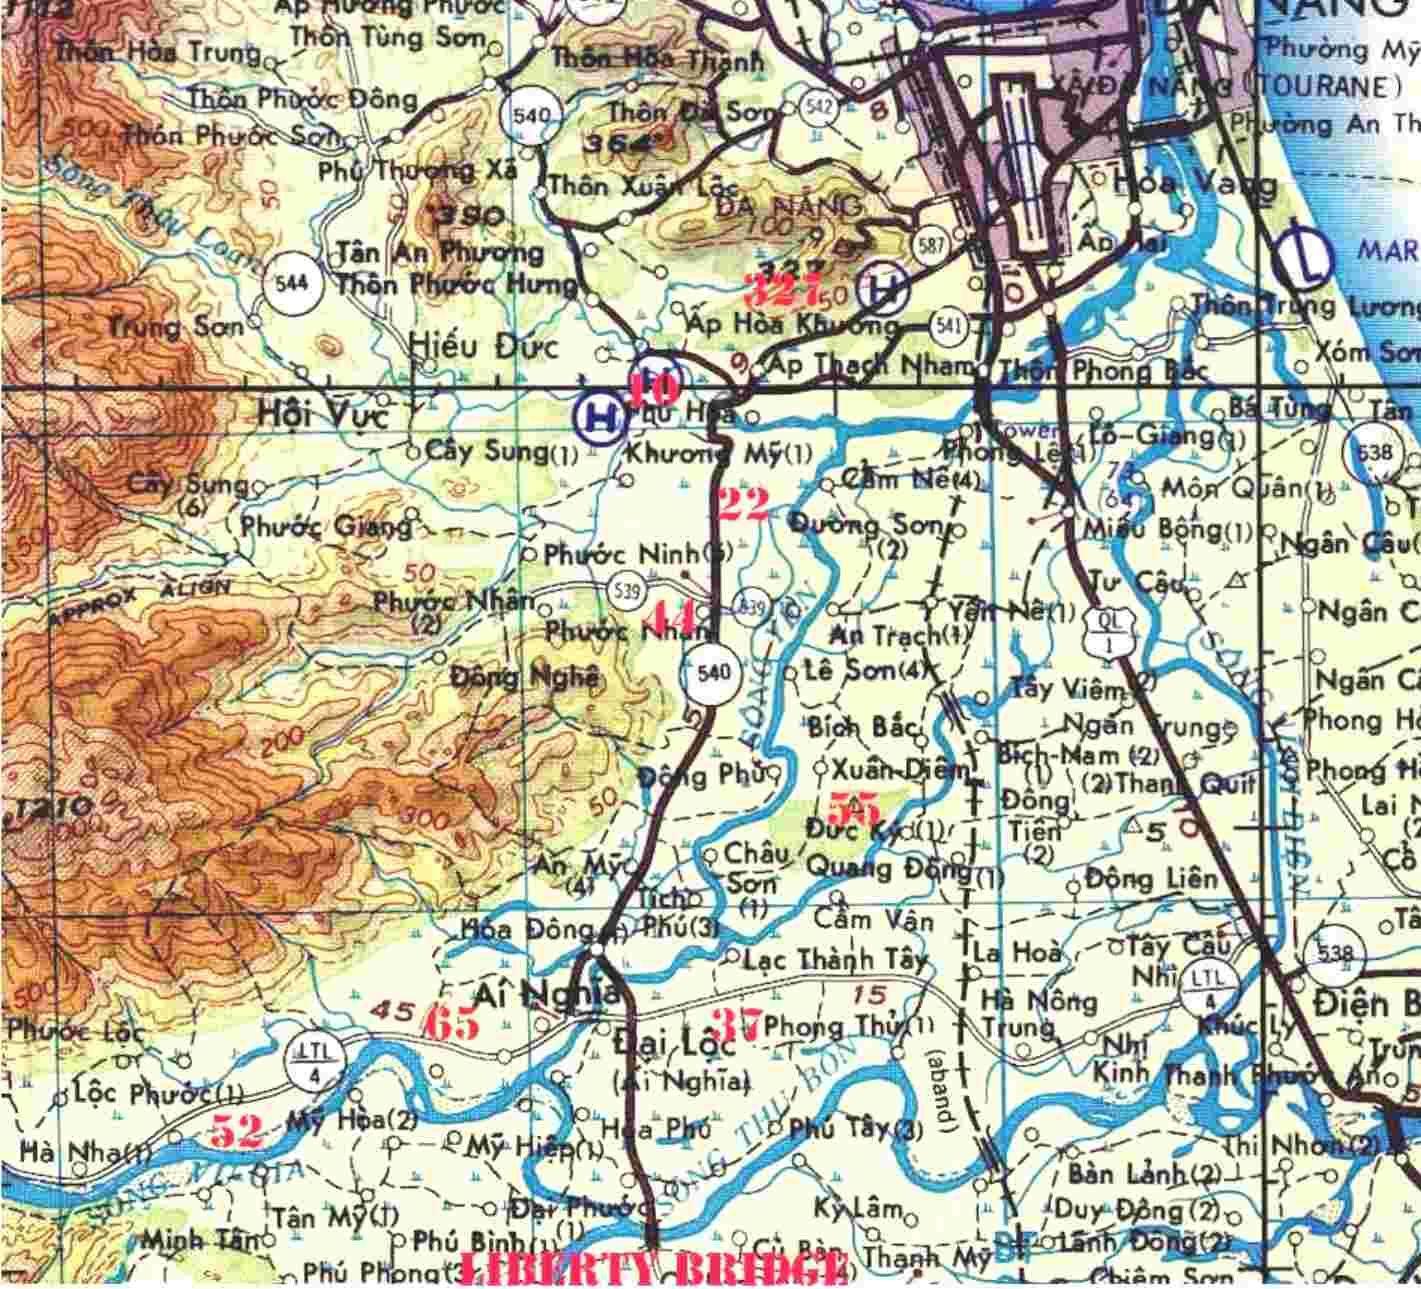 Rd Marine Division Vietnam War VIETNAM WAR - Us marine map reading kia